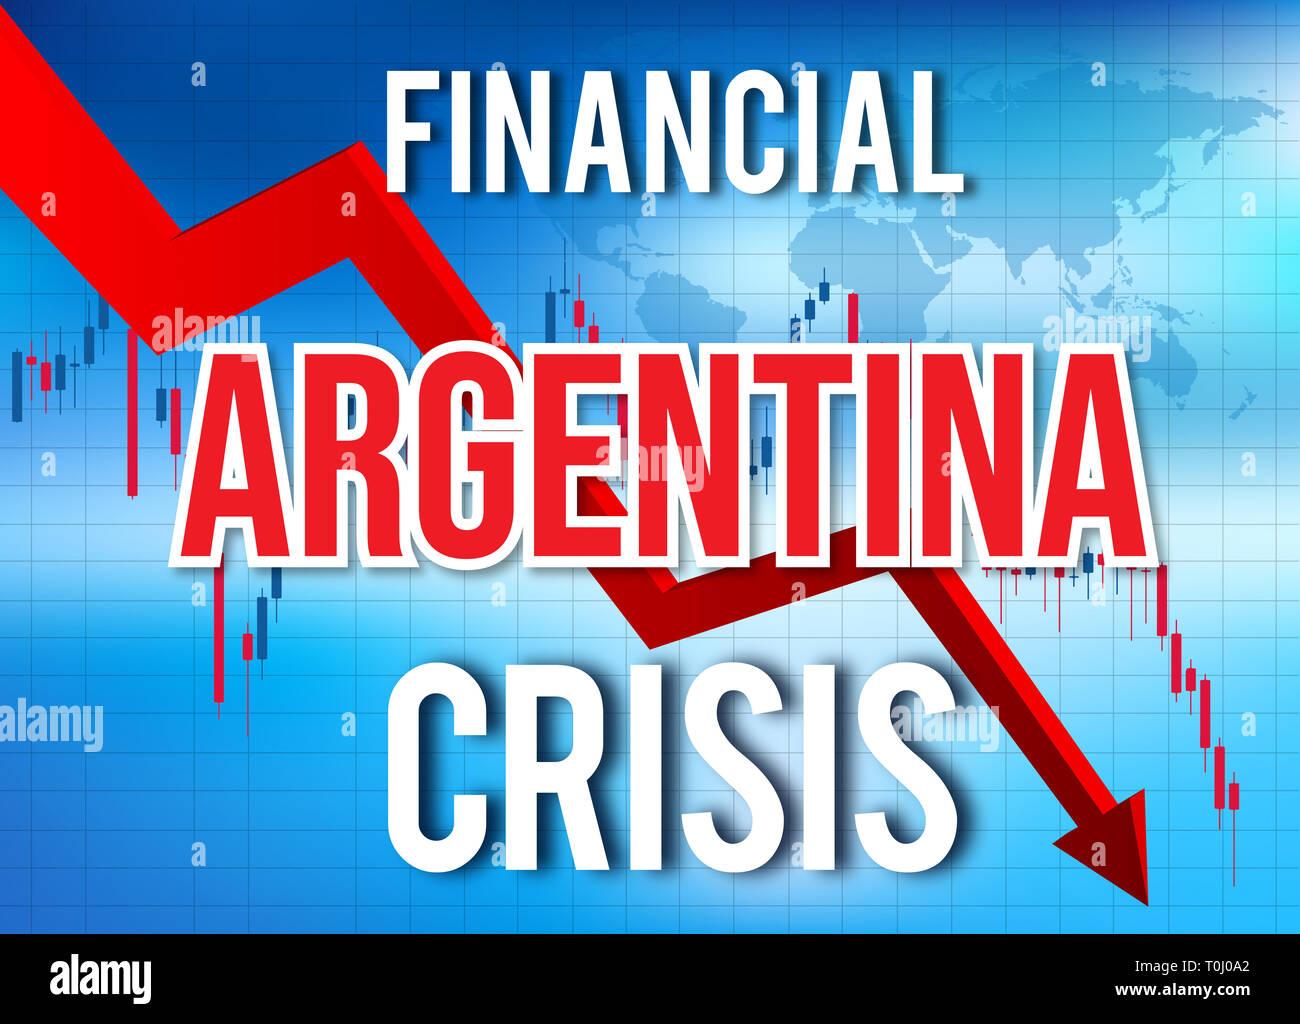 Argentina Financial Crisis Economic Collapse Market Crash Global Meltdown Illustration. - Stock Image